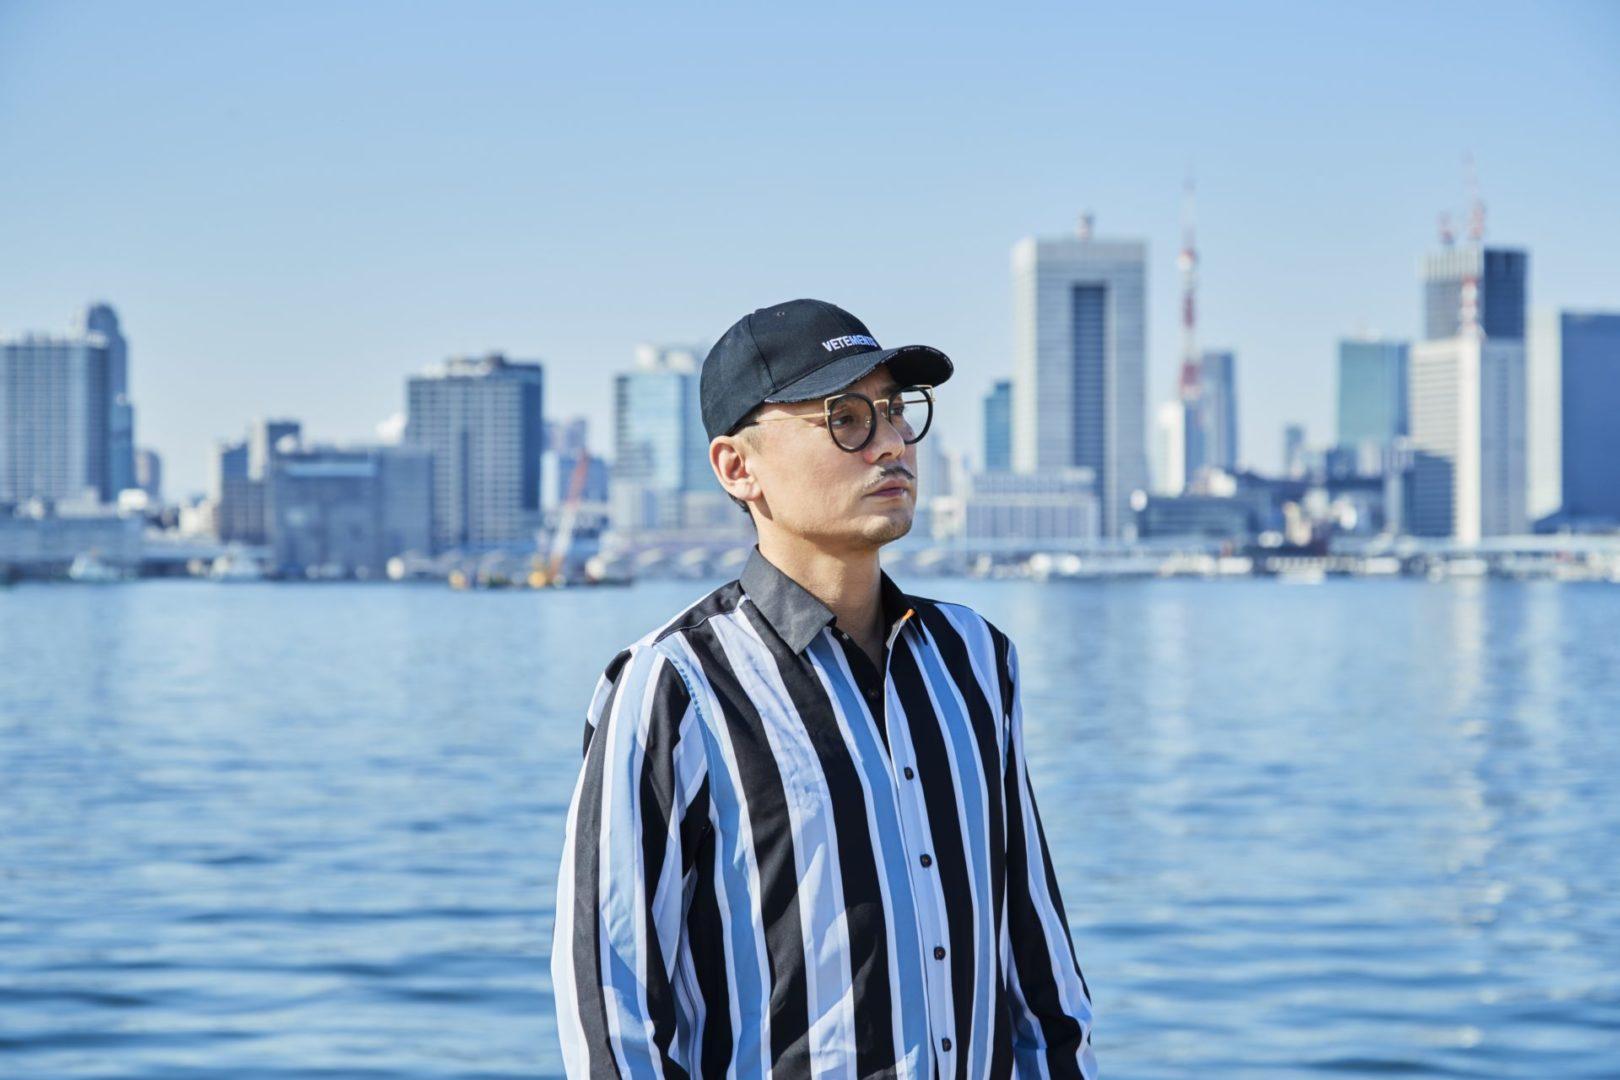 SPICY CHOCOLATE『一度きりの feat. 寿君, APOLLO & RAY』